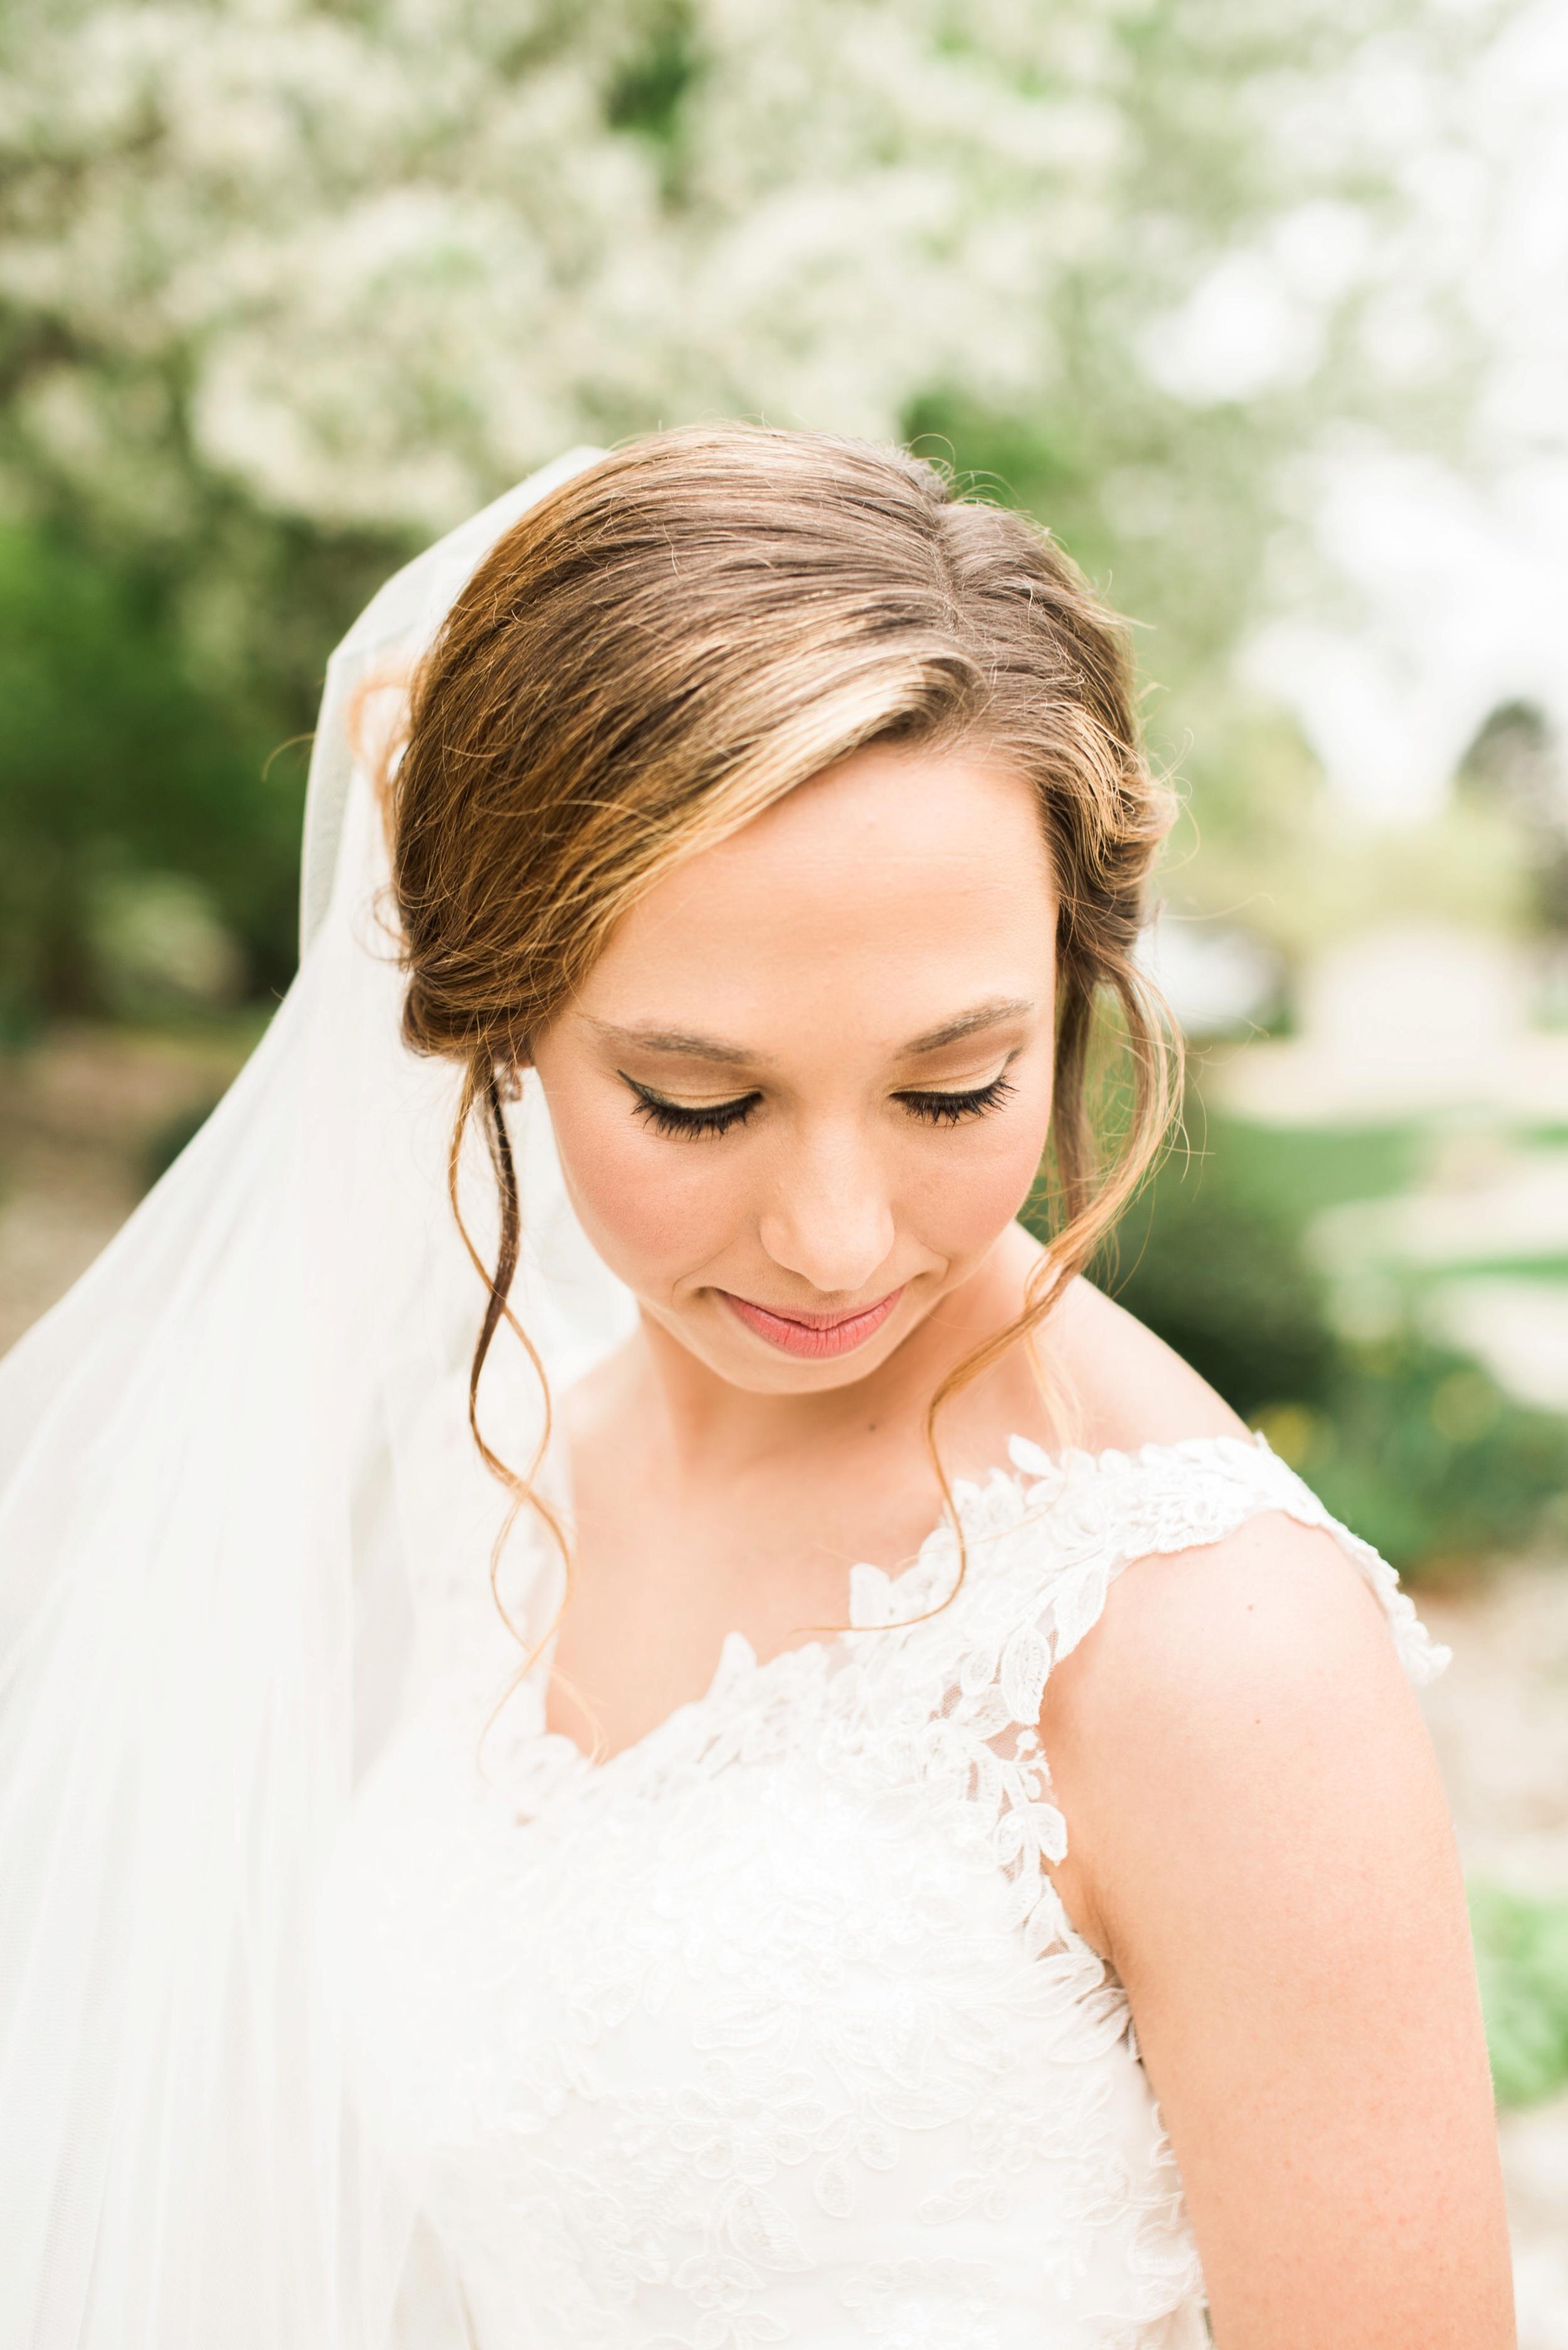 Pleasant Hill Des Moines Wedding Photographer_2135.jpg